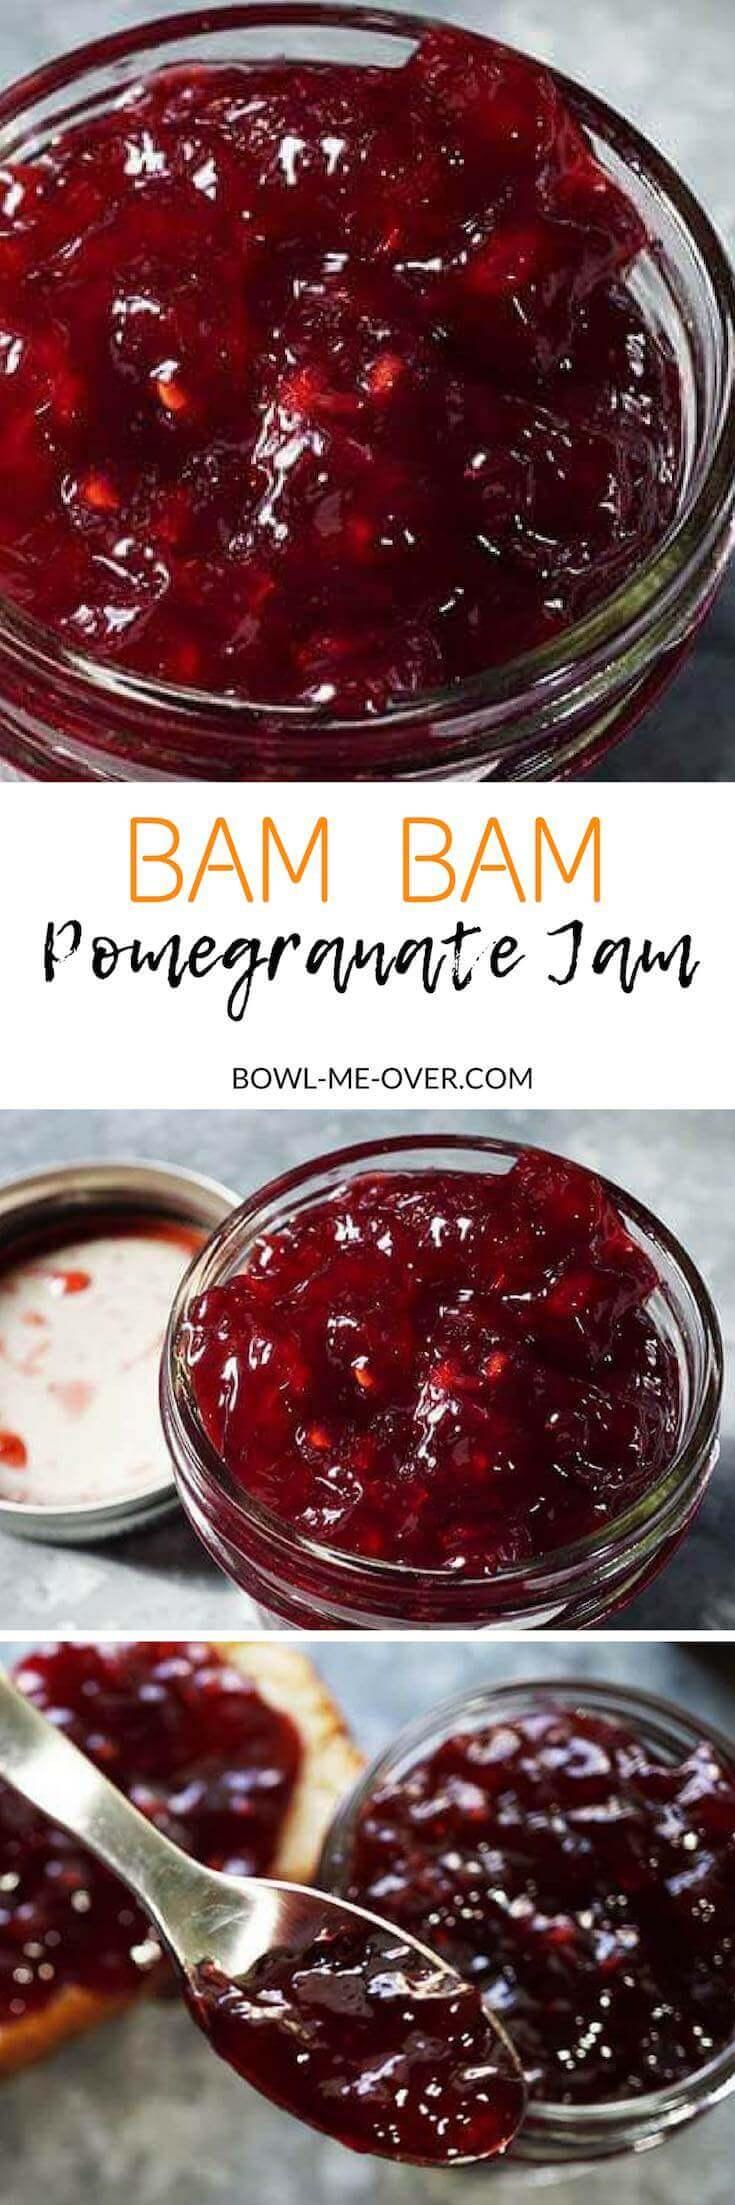 Homemade Jam is a great gift for the holidays! #HomemadeJam #PomegranateJam